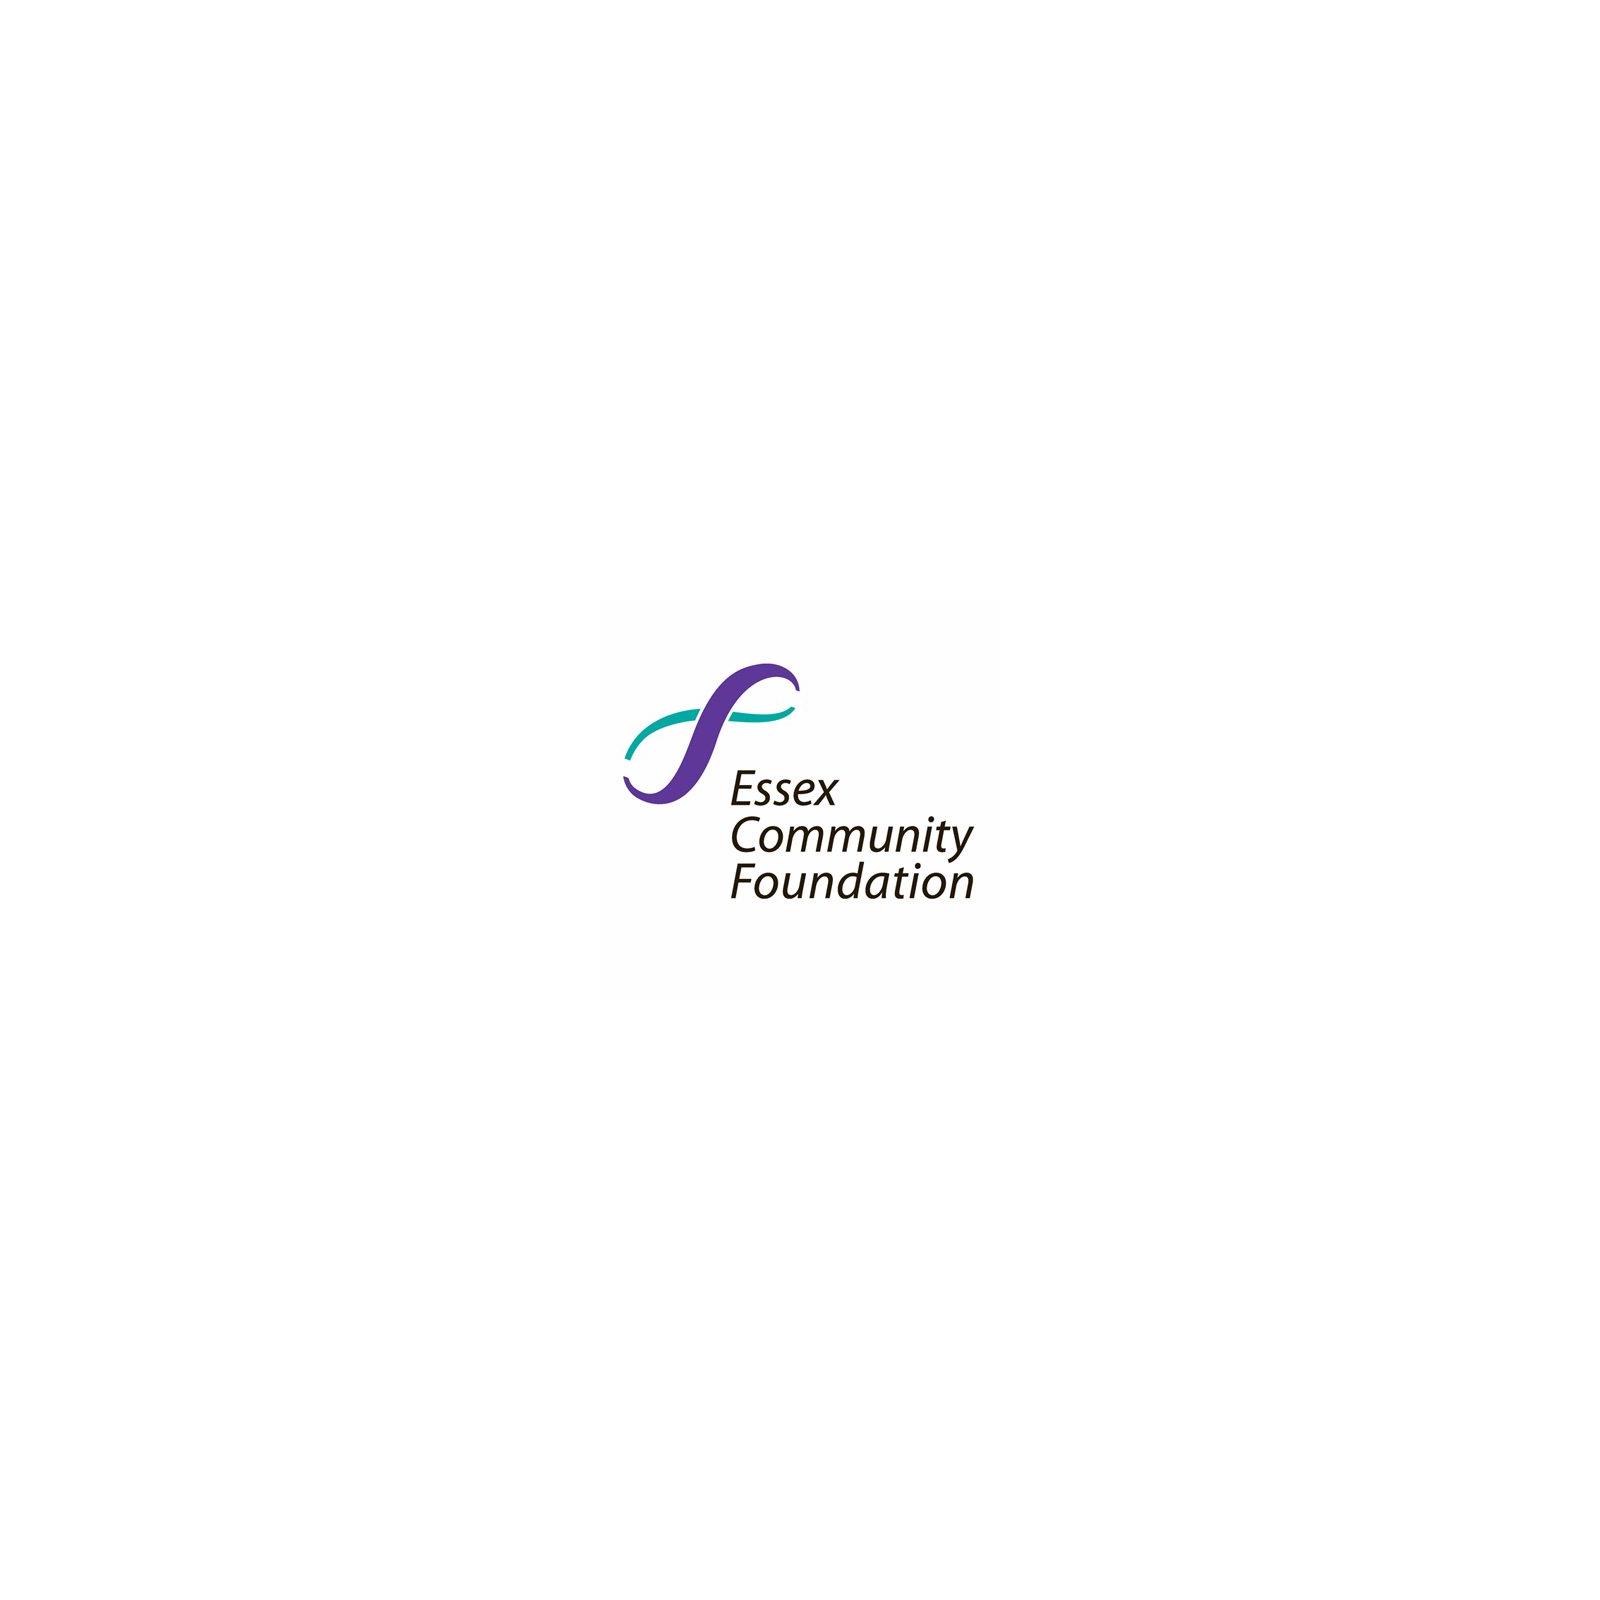 Essex Community Foundation